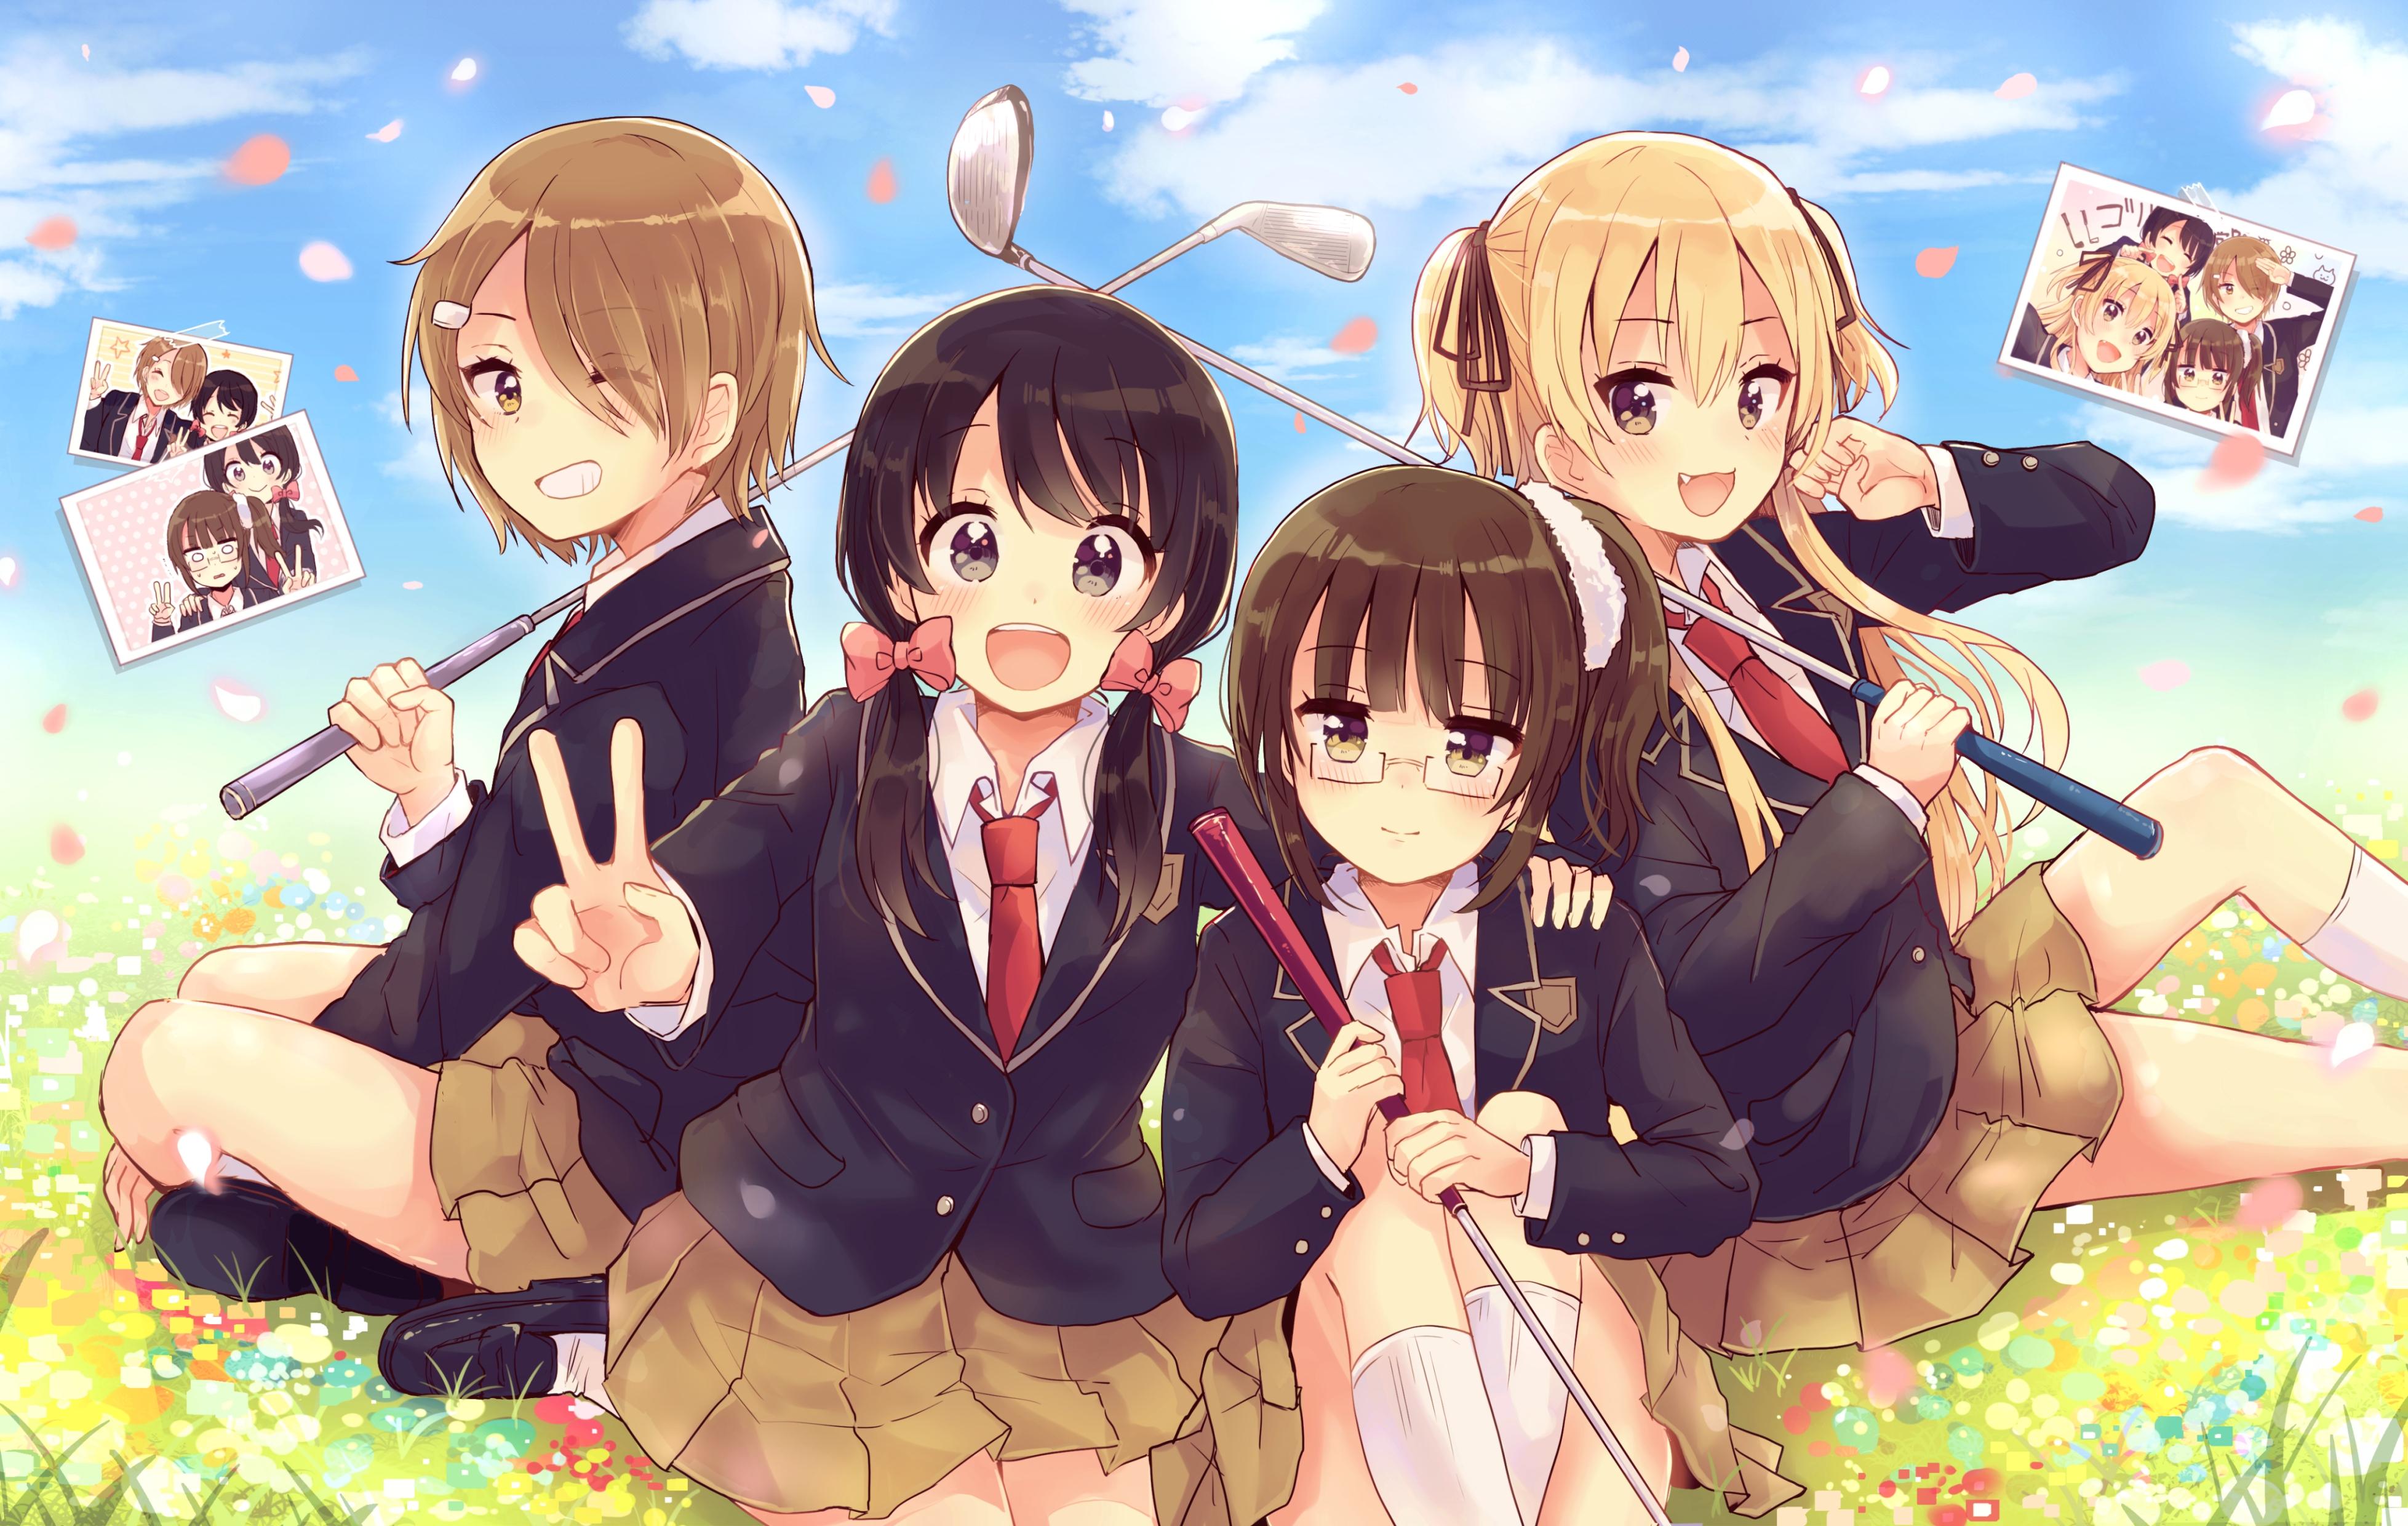 Wallpapers Anime Girl Cute خلفيات انمي بنات صداقة صور خلفيات بنات انمي صديقات خلفيات